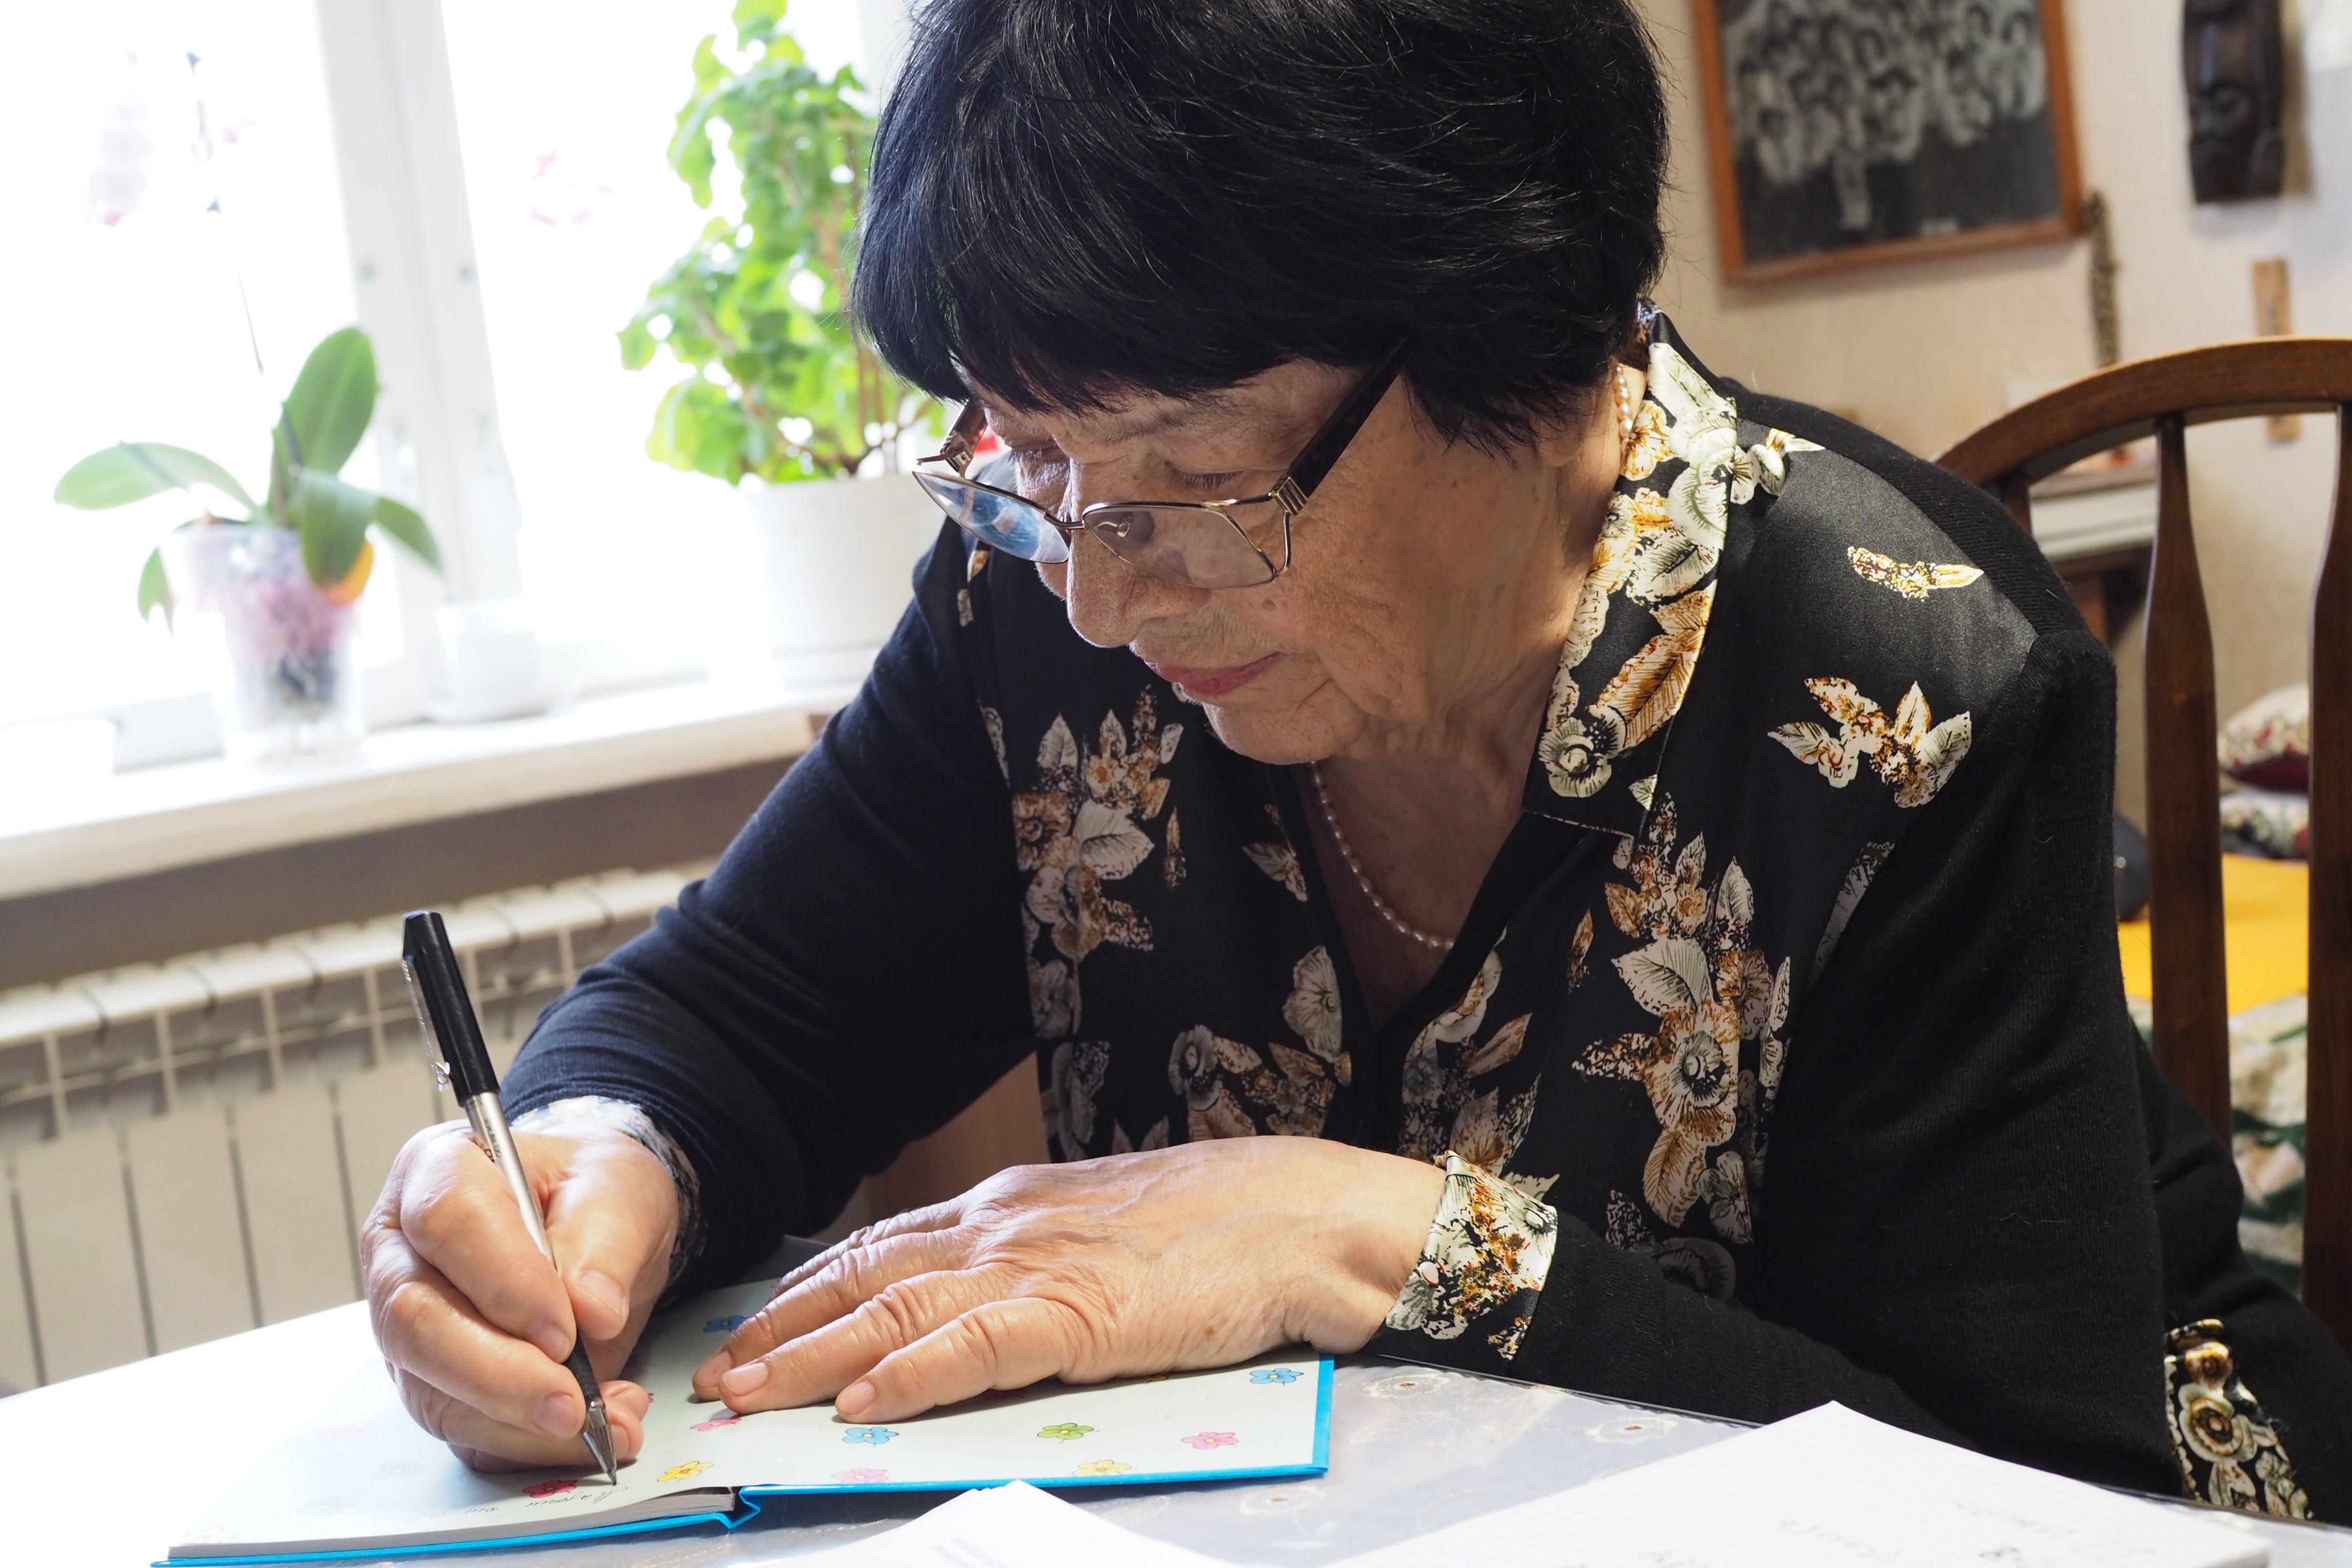 23 февраля 2019 г. Римма Петровна у себя дома. Фото: из личного архива